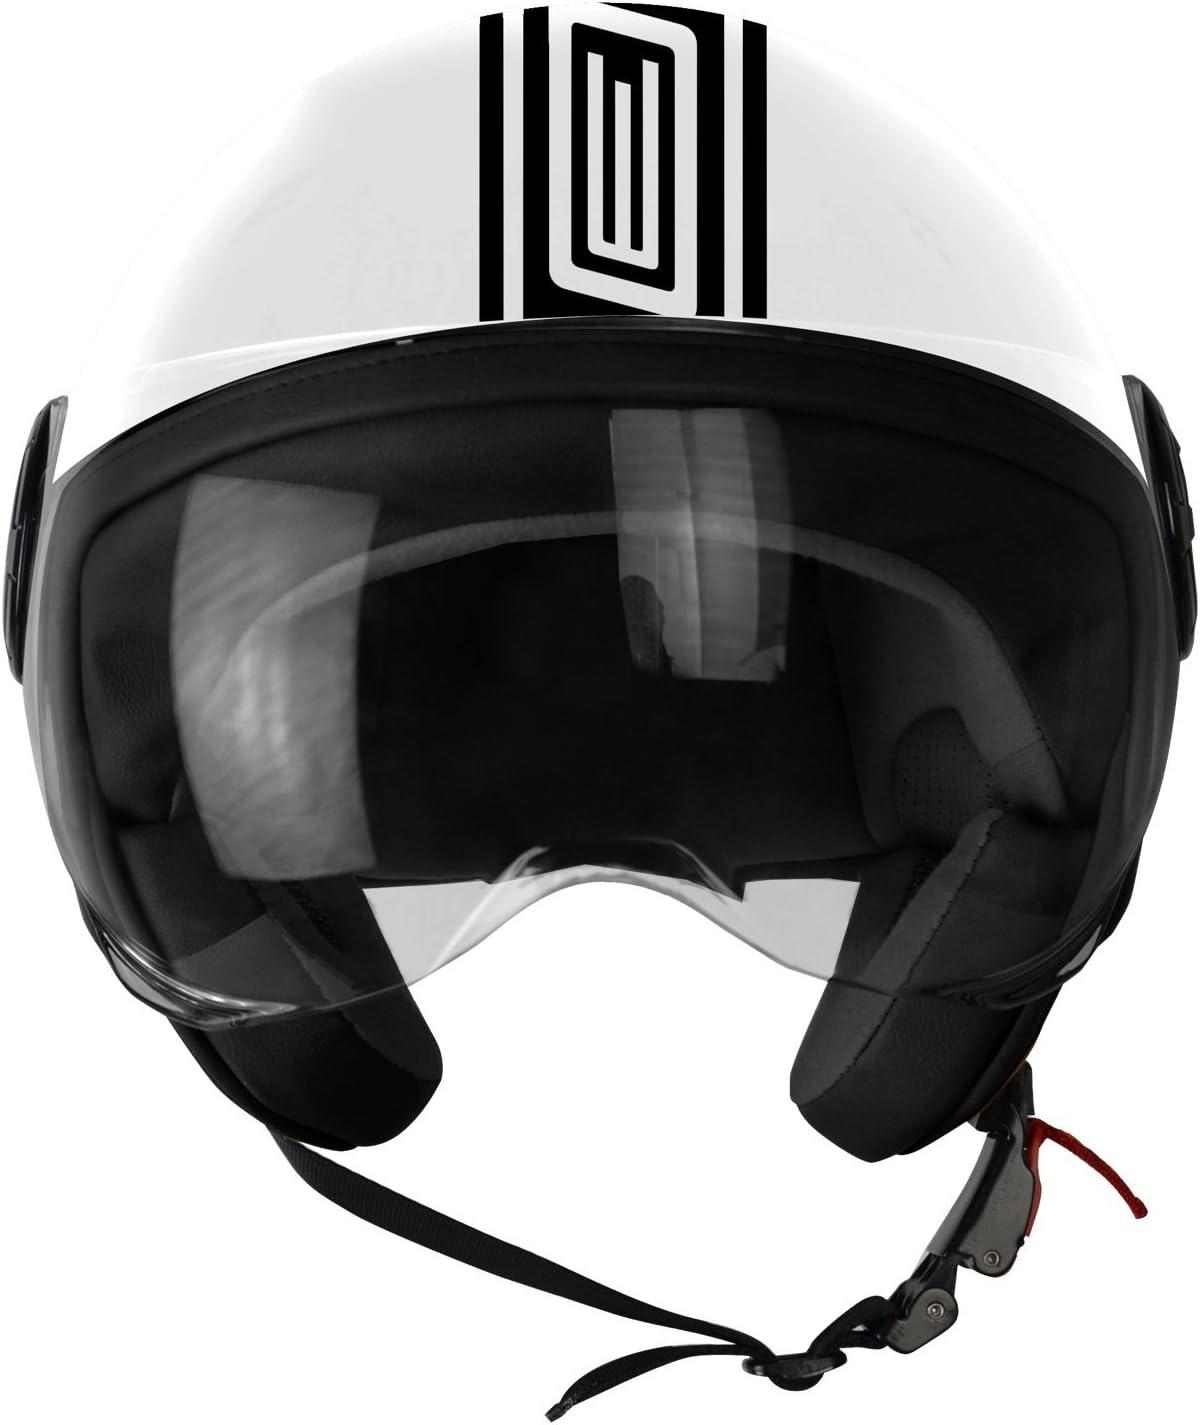 Casco Demi Jet 201585028100103/Neon Street S Origine Helmets blanco